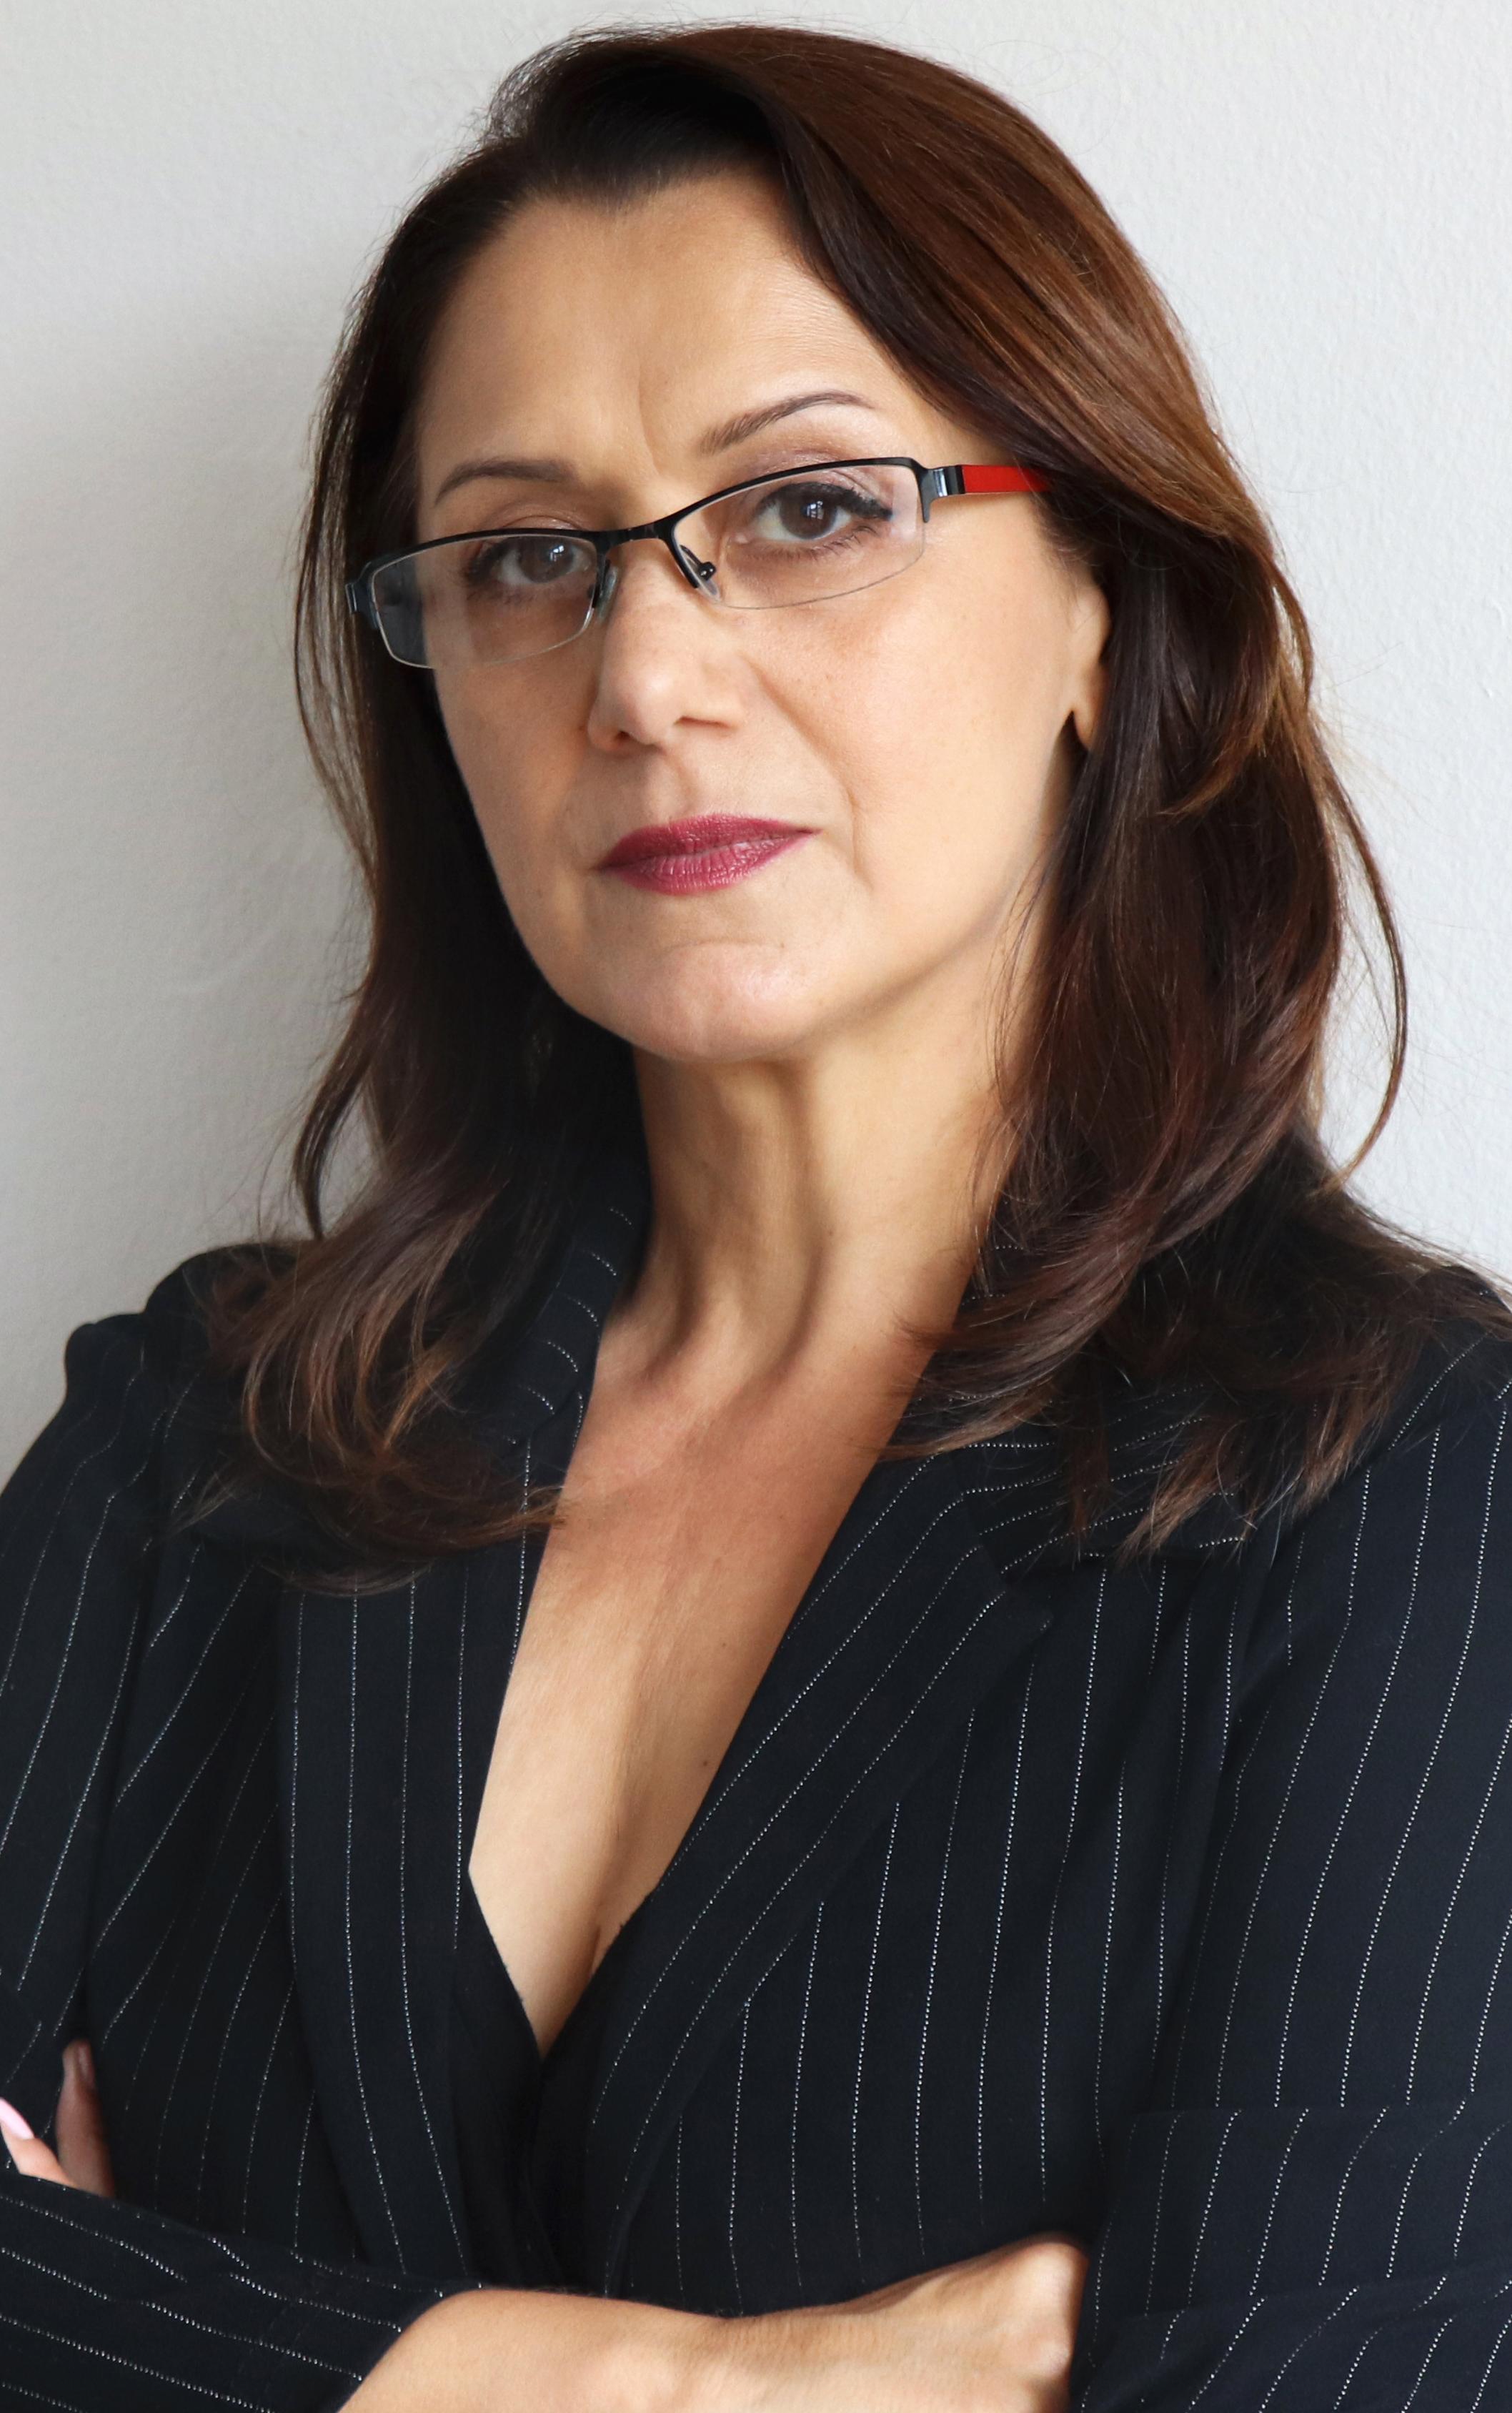 Sherry Glasses 1